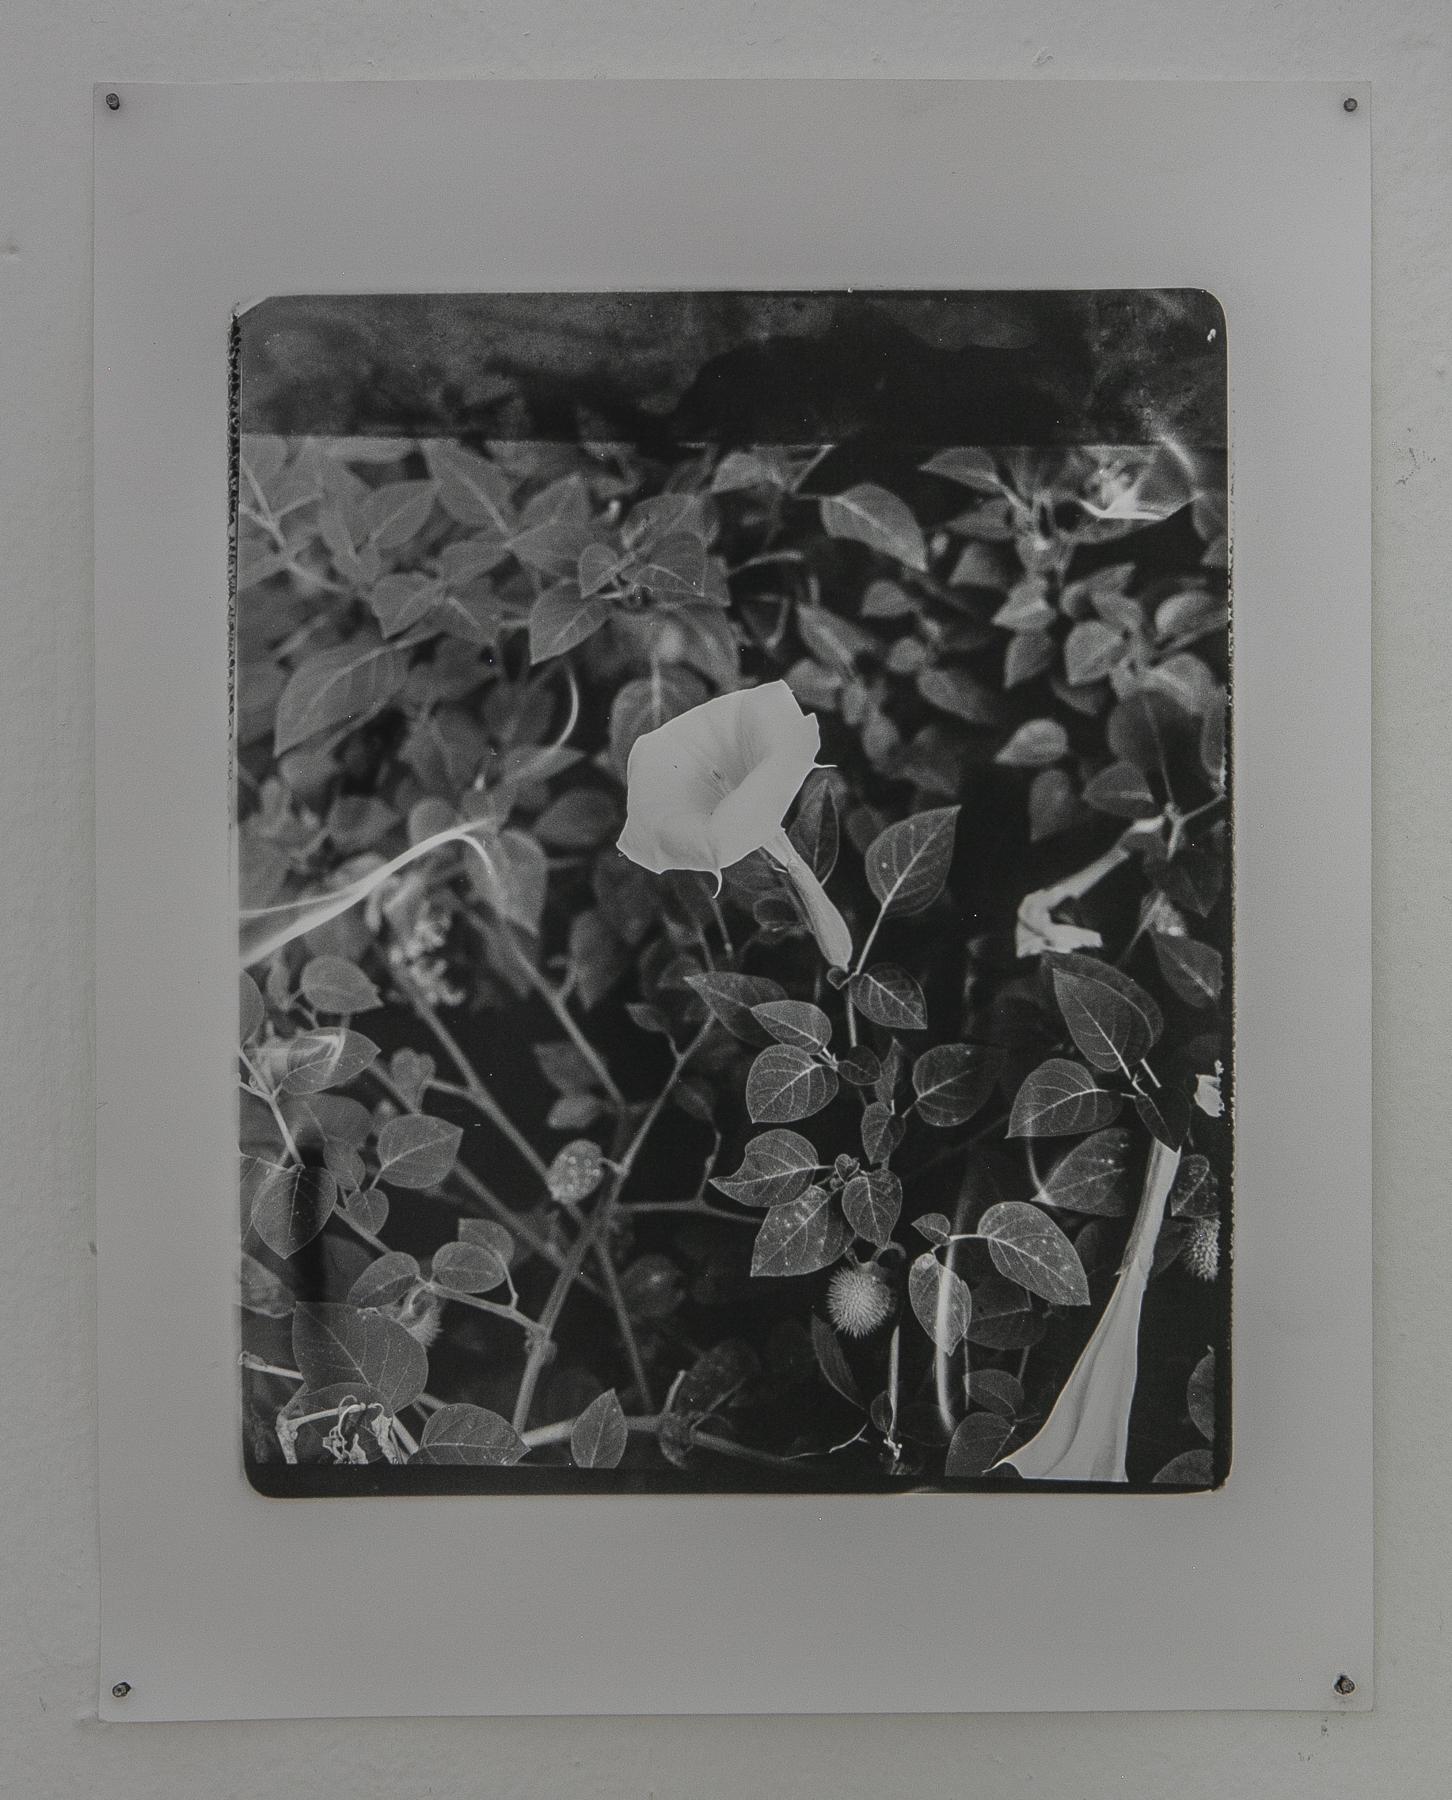 Daniel Hojnacki,  Moon Flower , Silver gelatin print, 2019